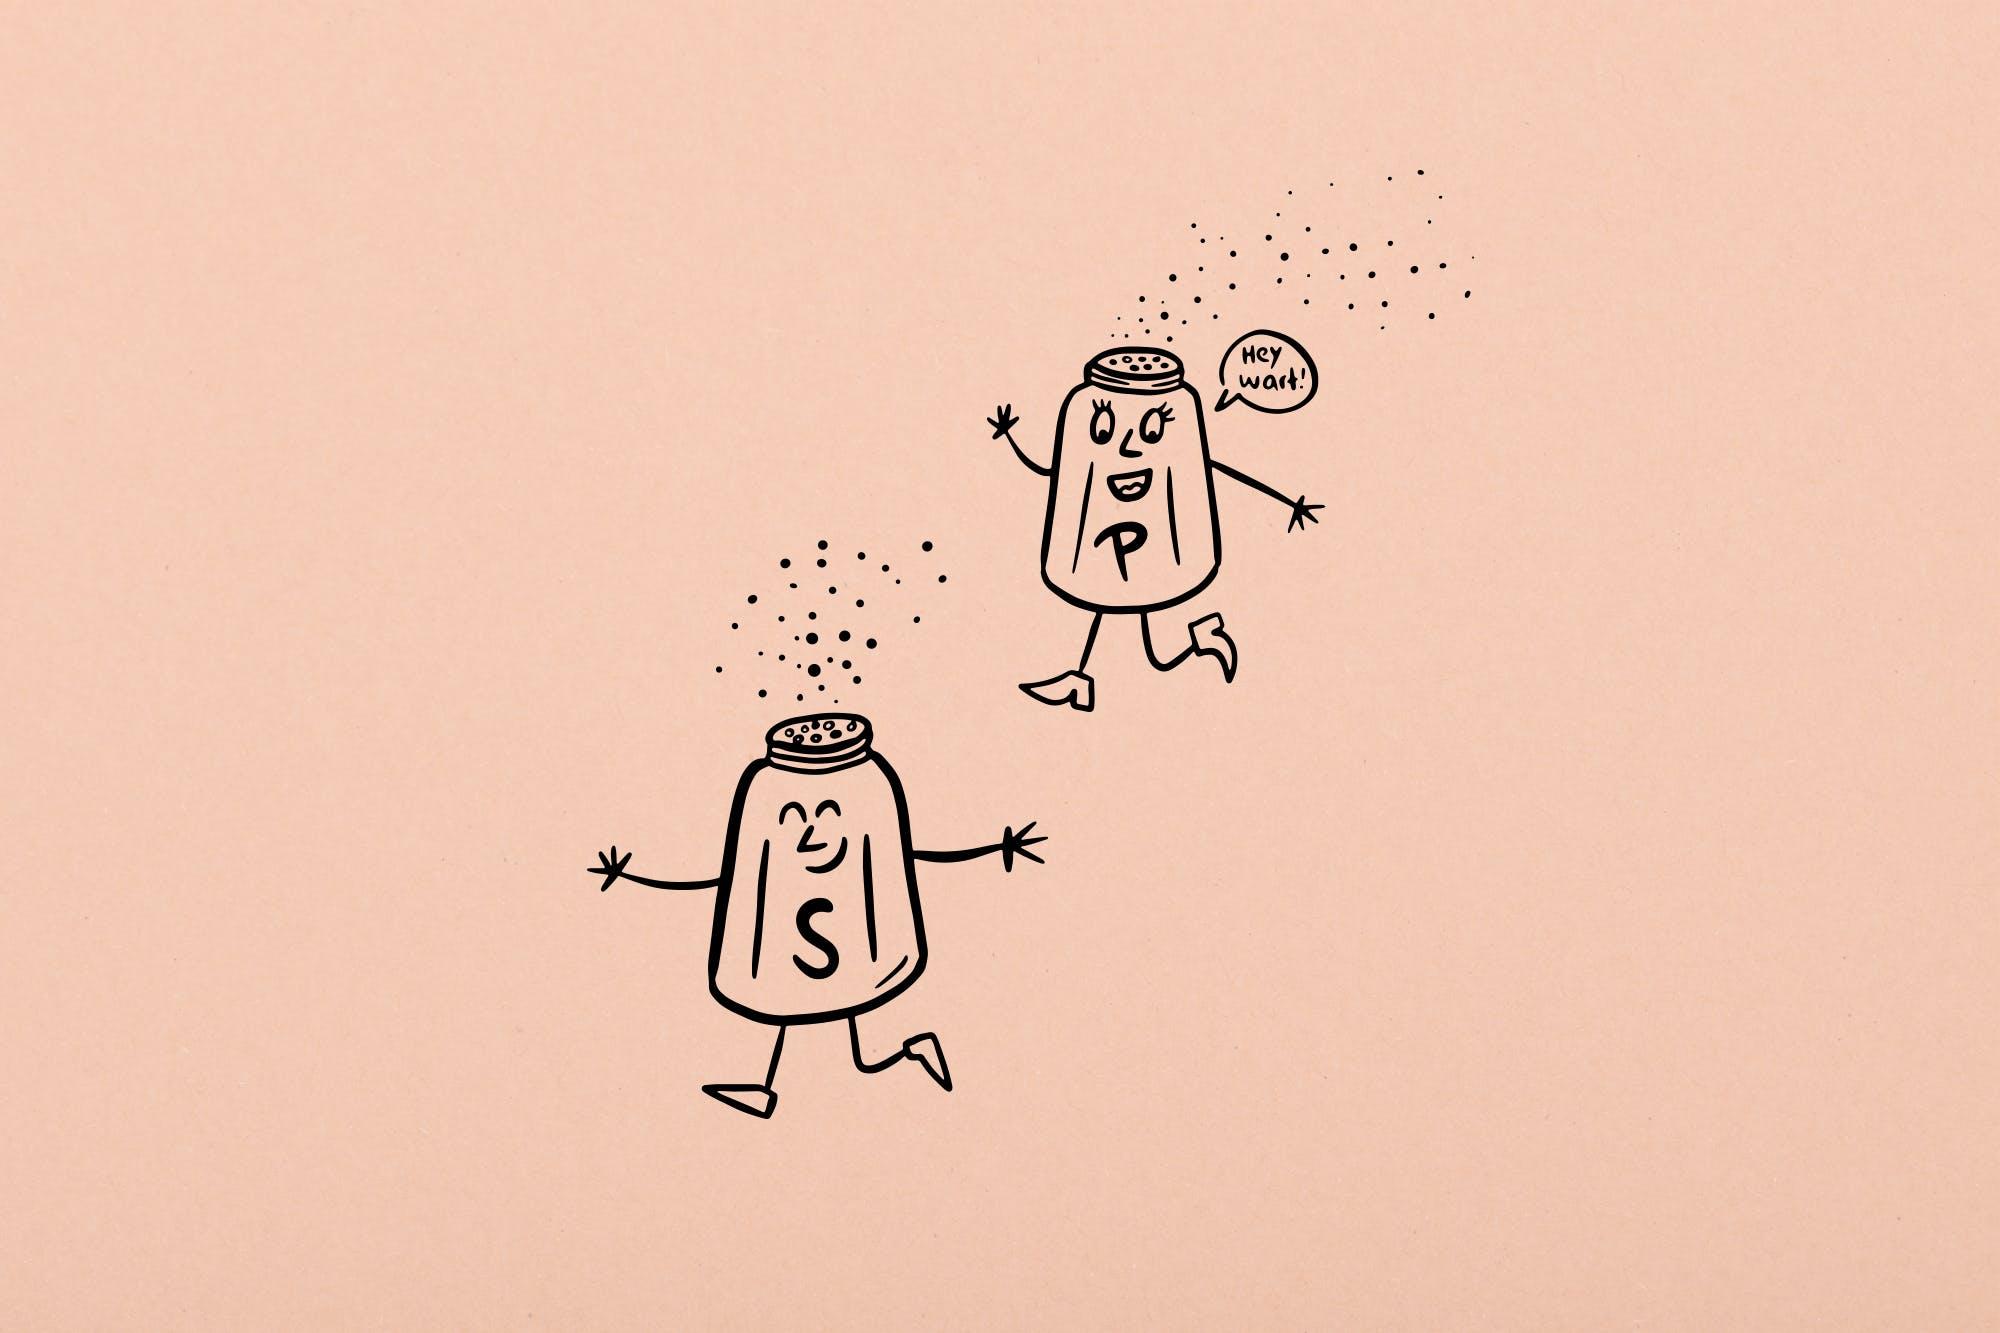 tibits illustration